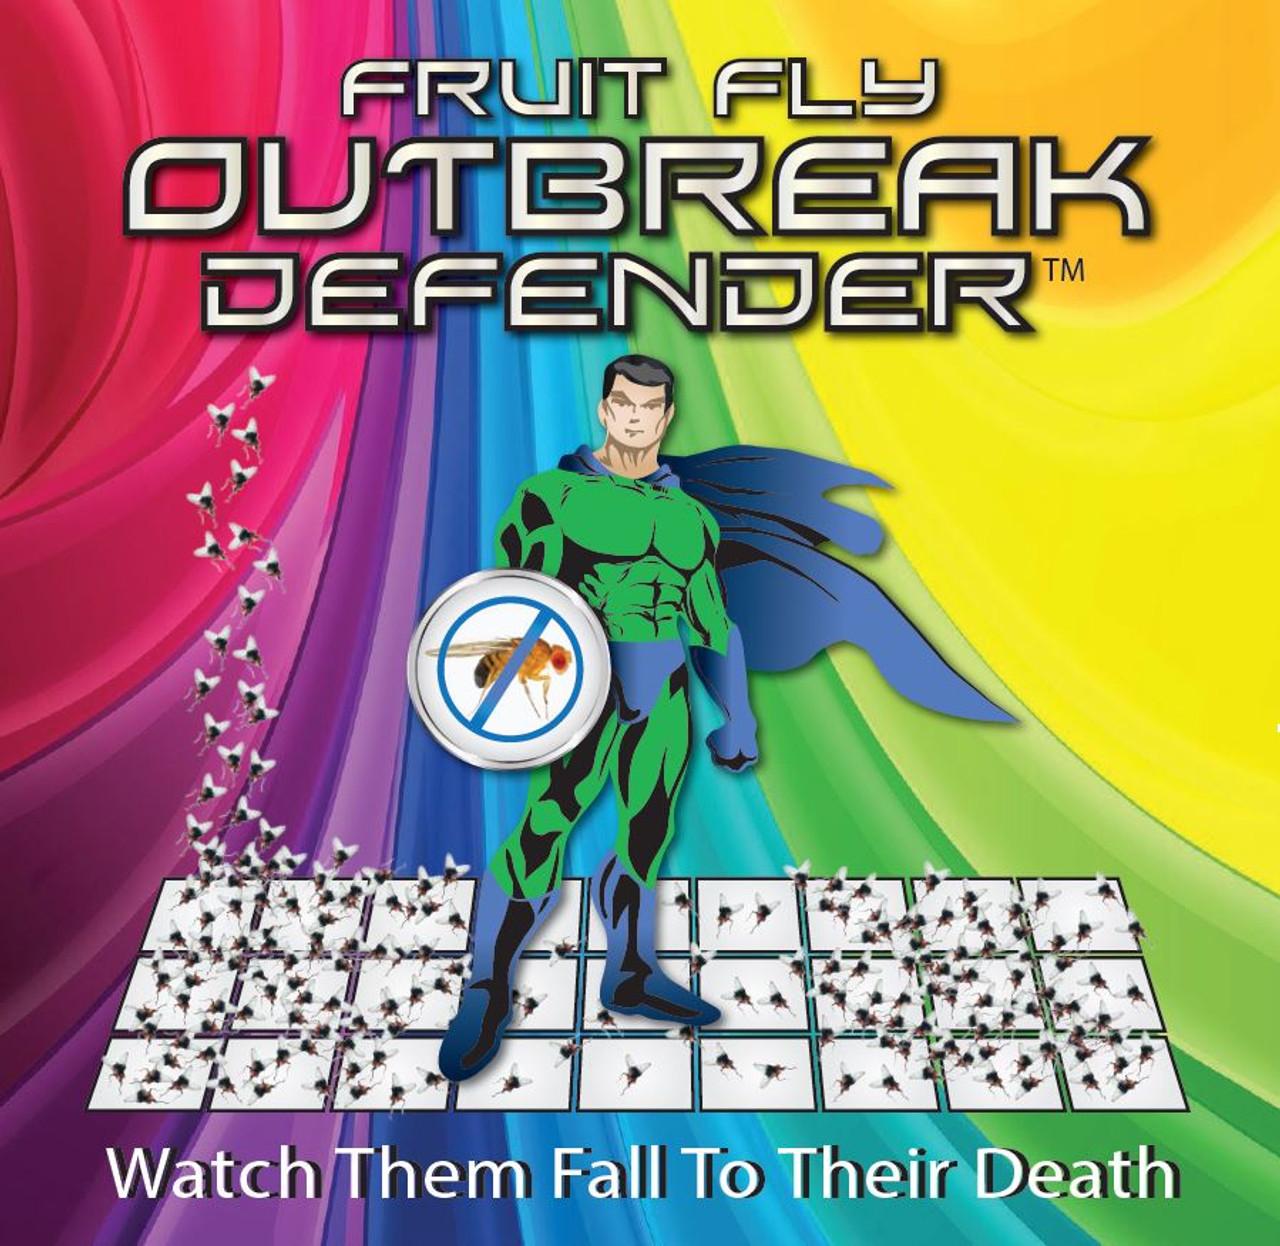 Outbreak Defender (Food-Safe Fruit Fly Control) Includes FOUR 16 oz bottles plus heavy duty wide mist sprayer